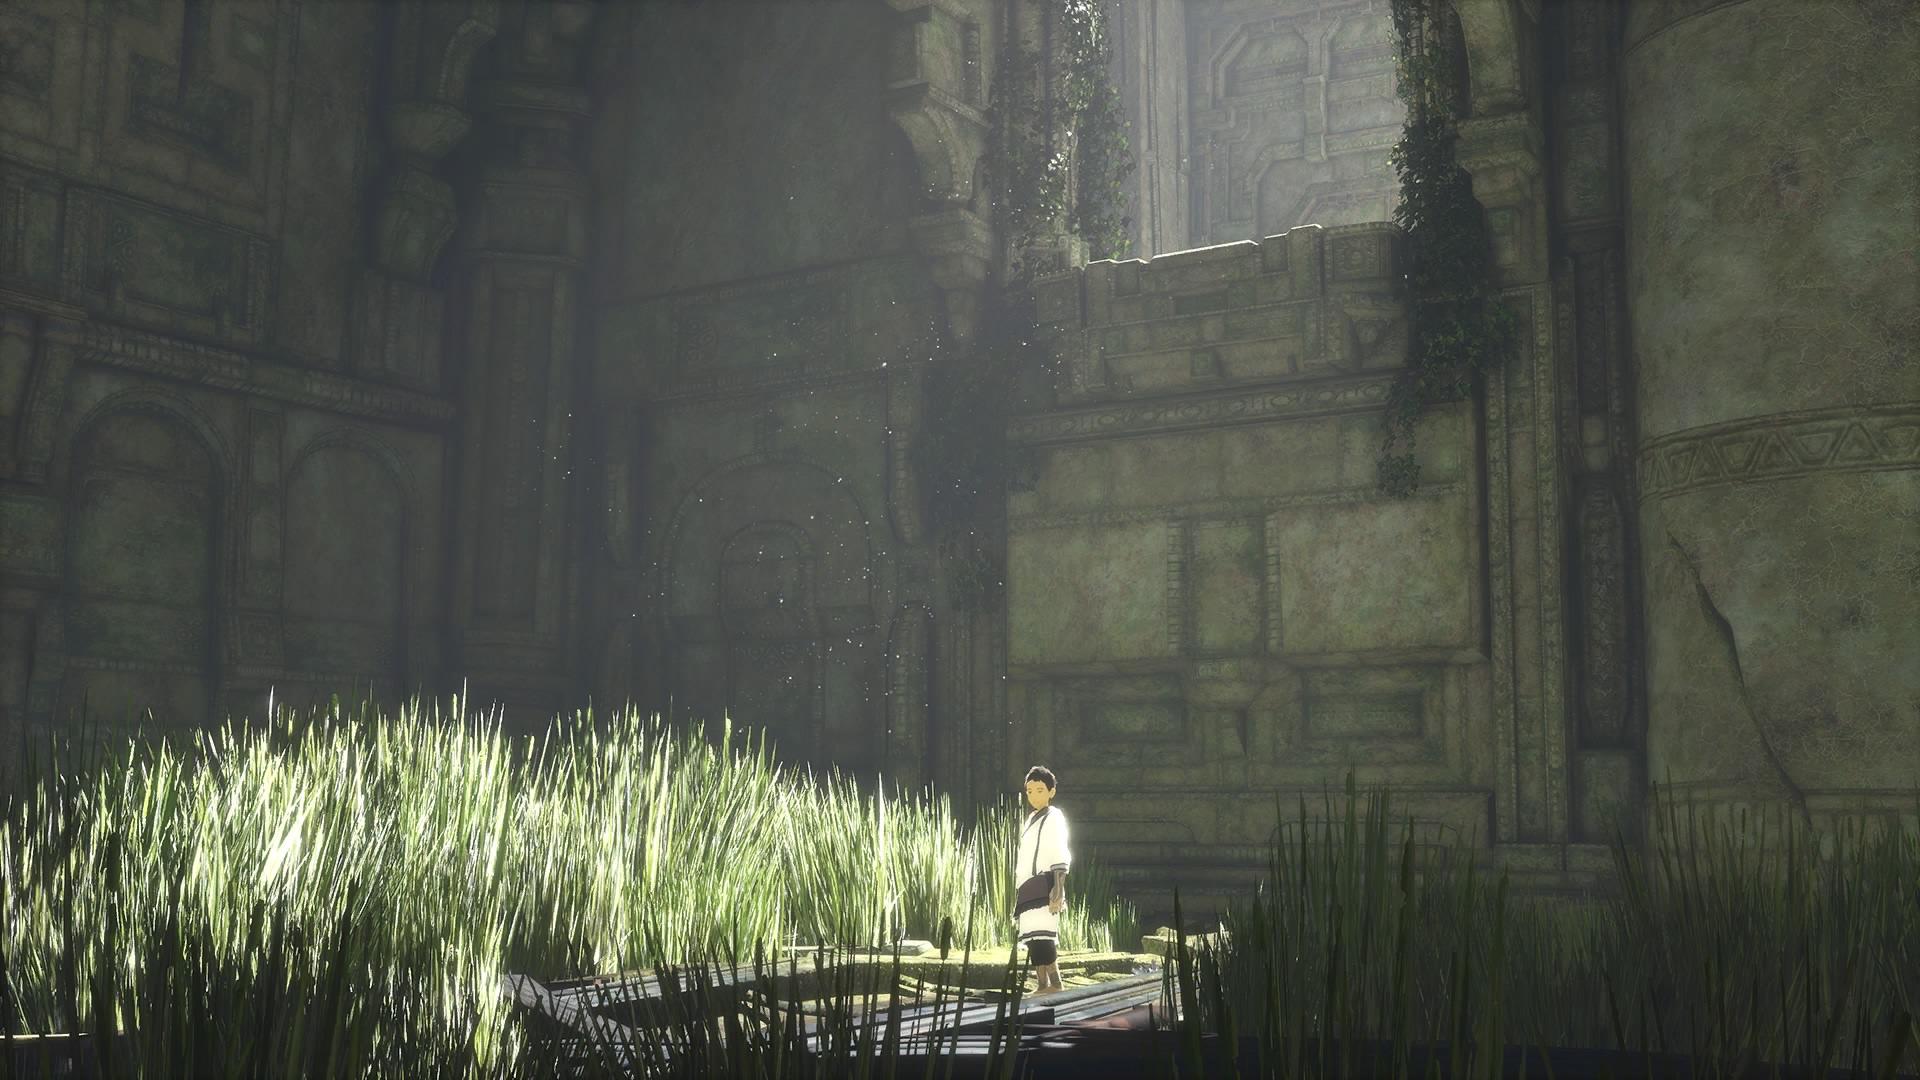 The Last Guardian © SIE Japan Studio, Sony Interactive Entertainment